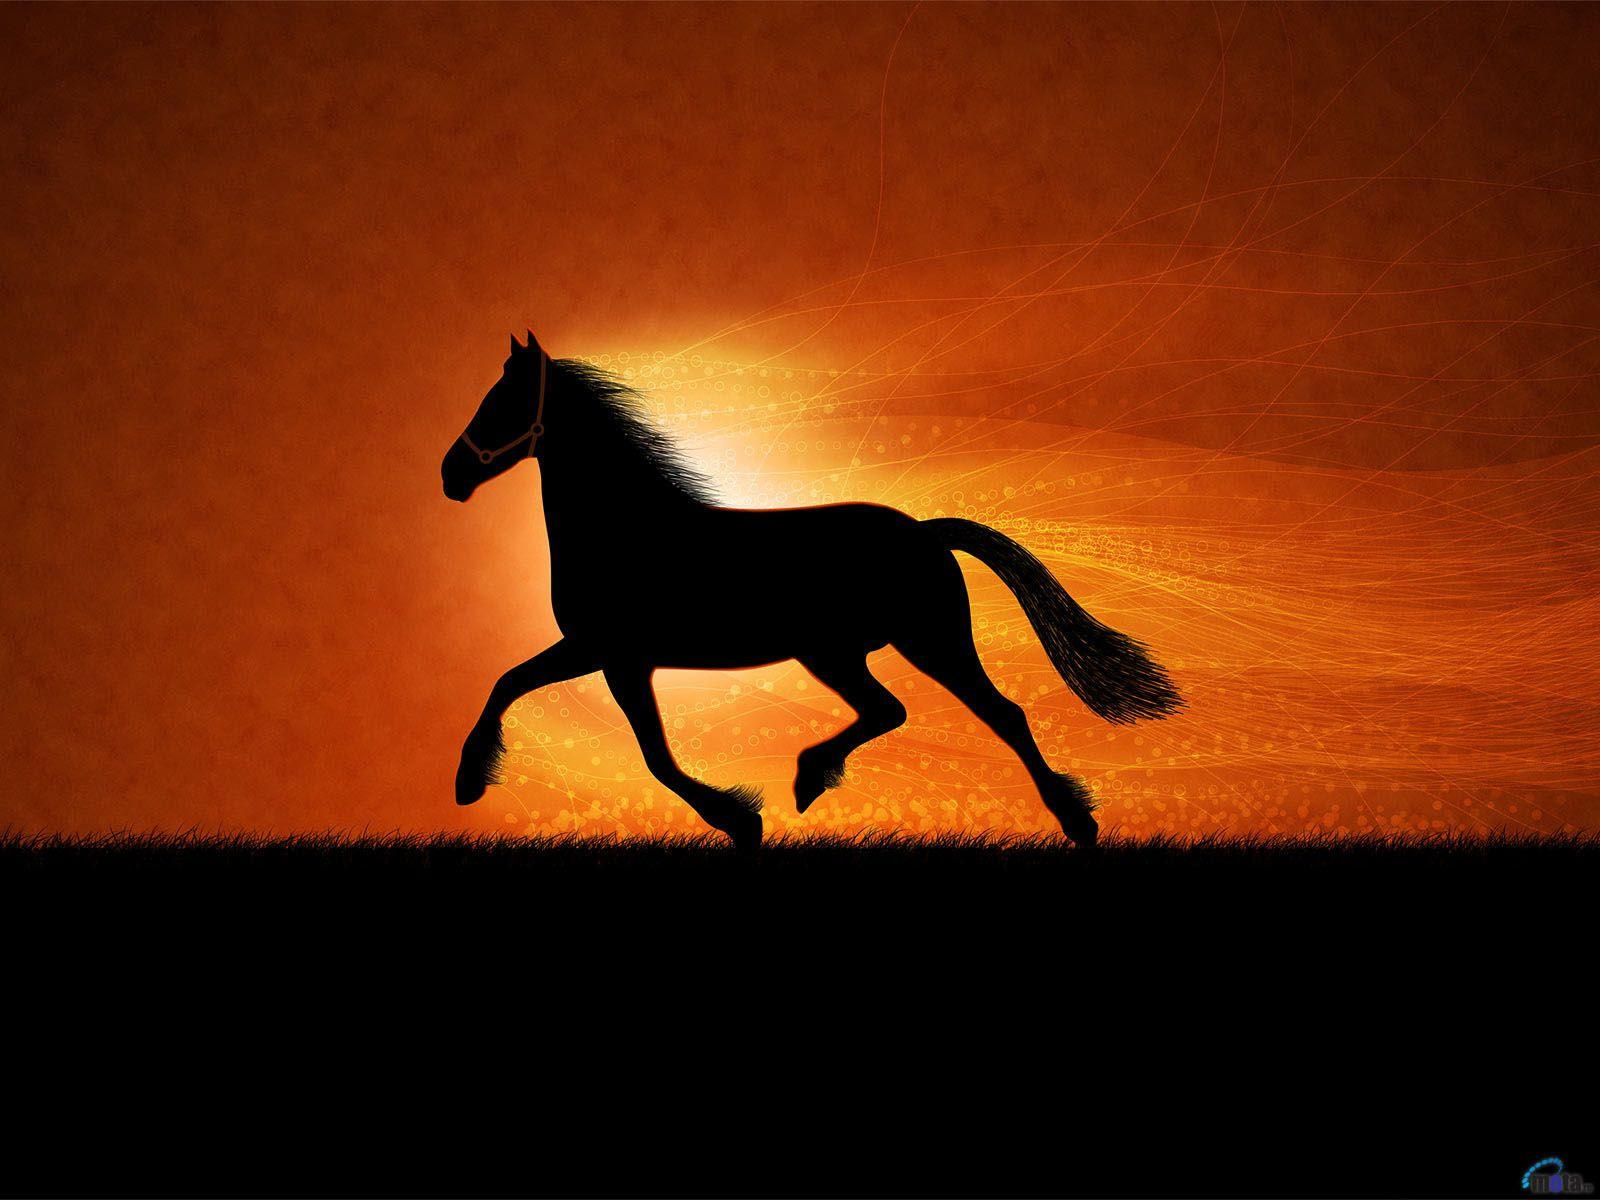 Beautiful Wallpaper Horse Sunrise - 68b6c55c201e9429d74cb3e7a1a52b1d  Pic_834065.jpg